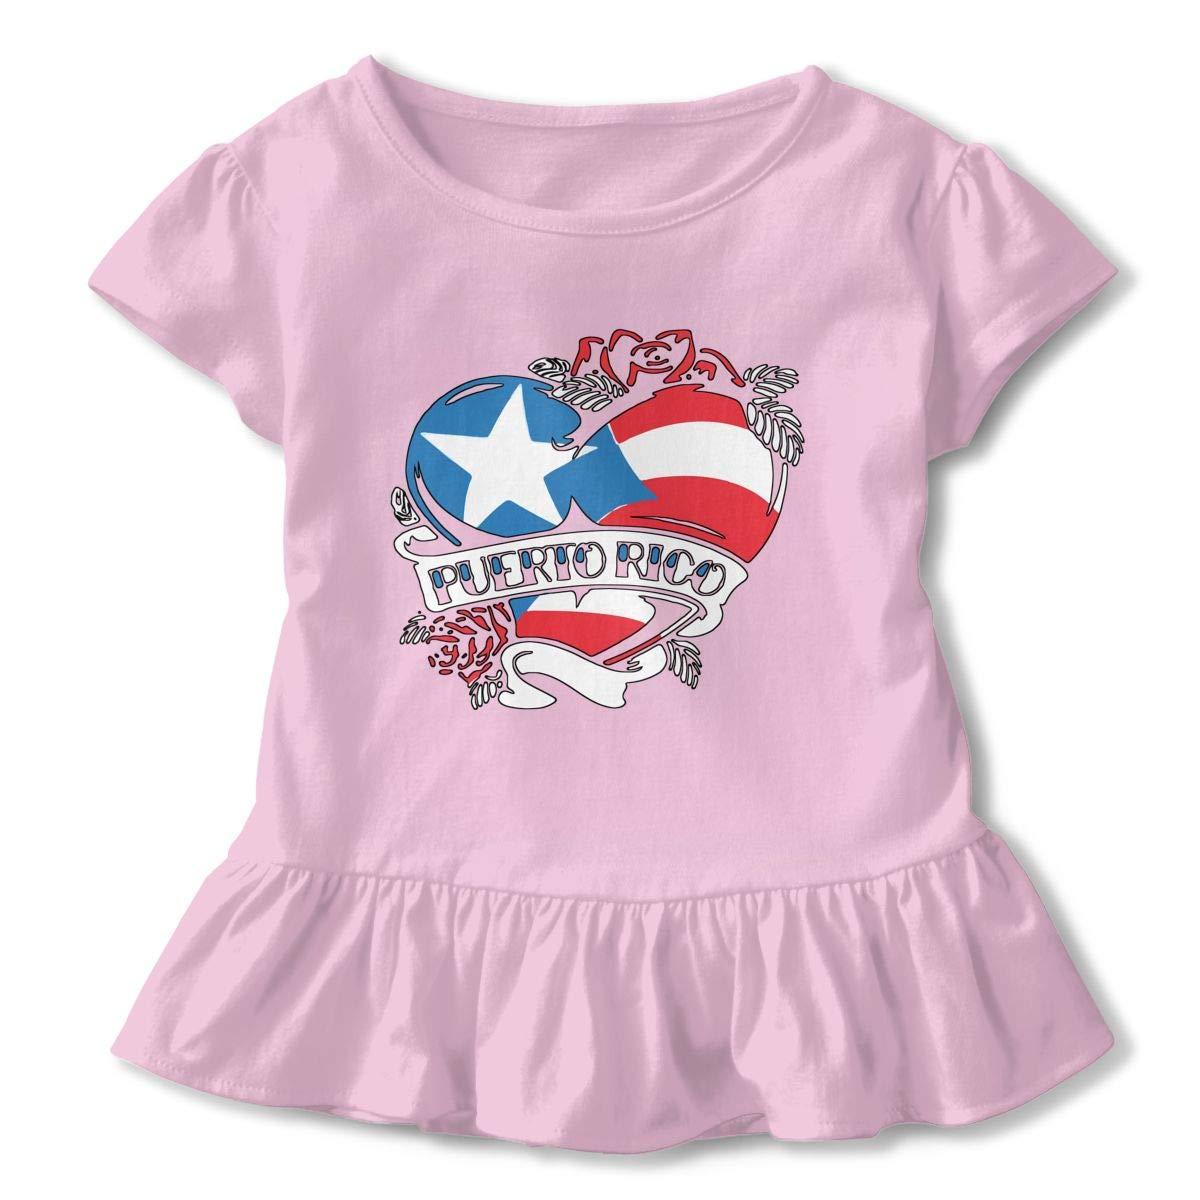 Puerto Rico Tattoo Heart Flag Toddler Girls T Shirt Kids Cotton Short Sleeve Ruffle Tee